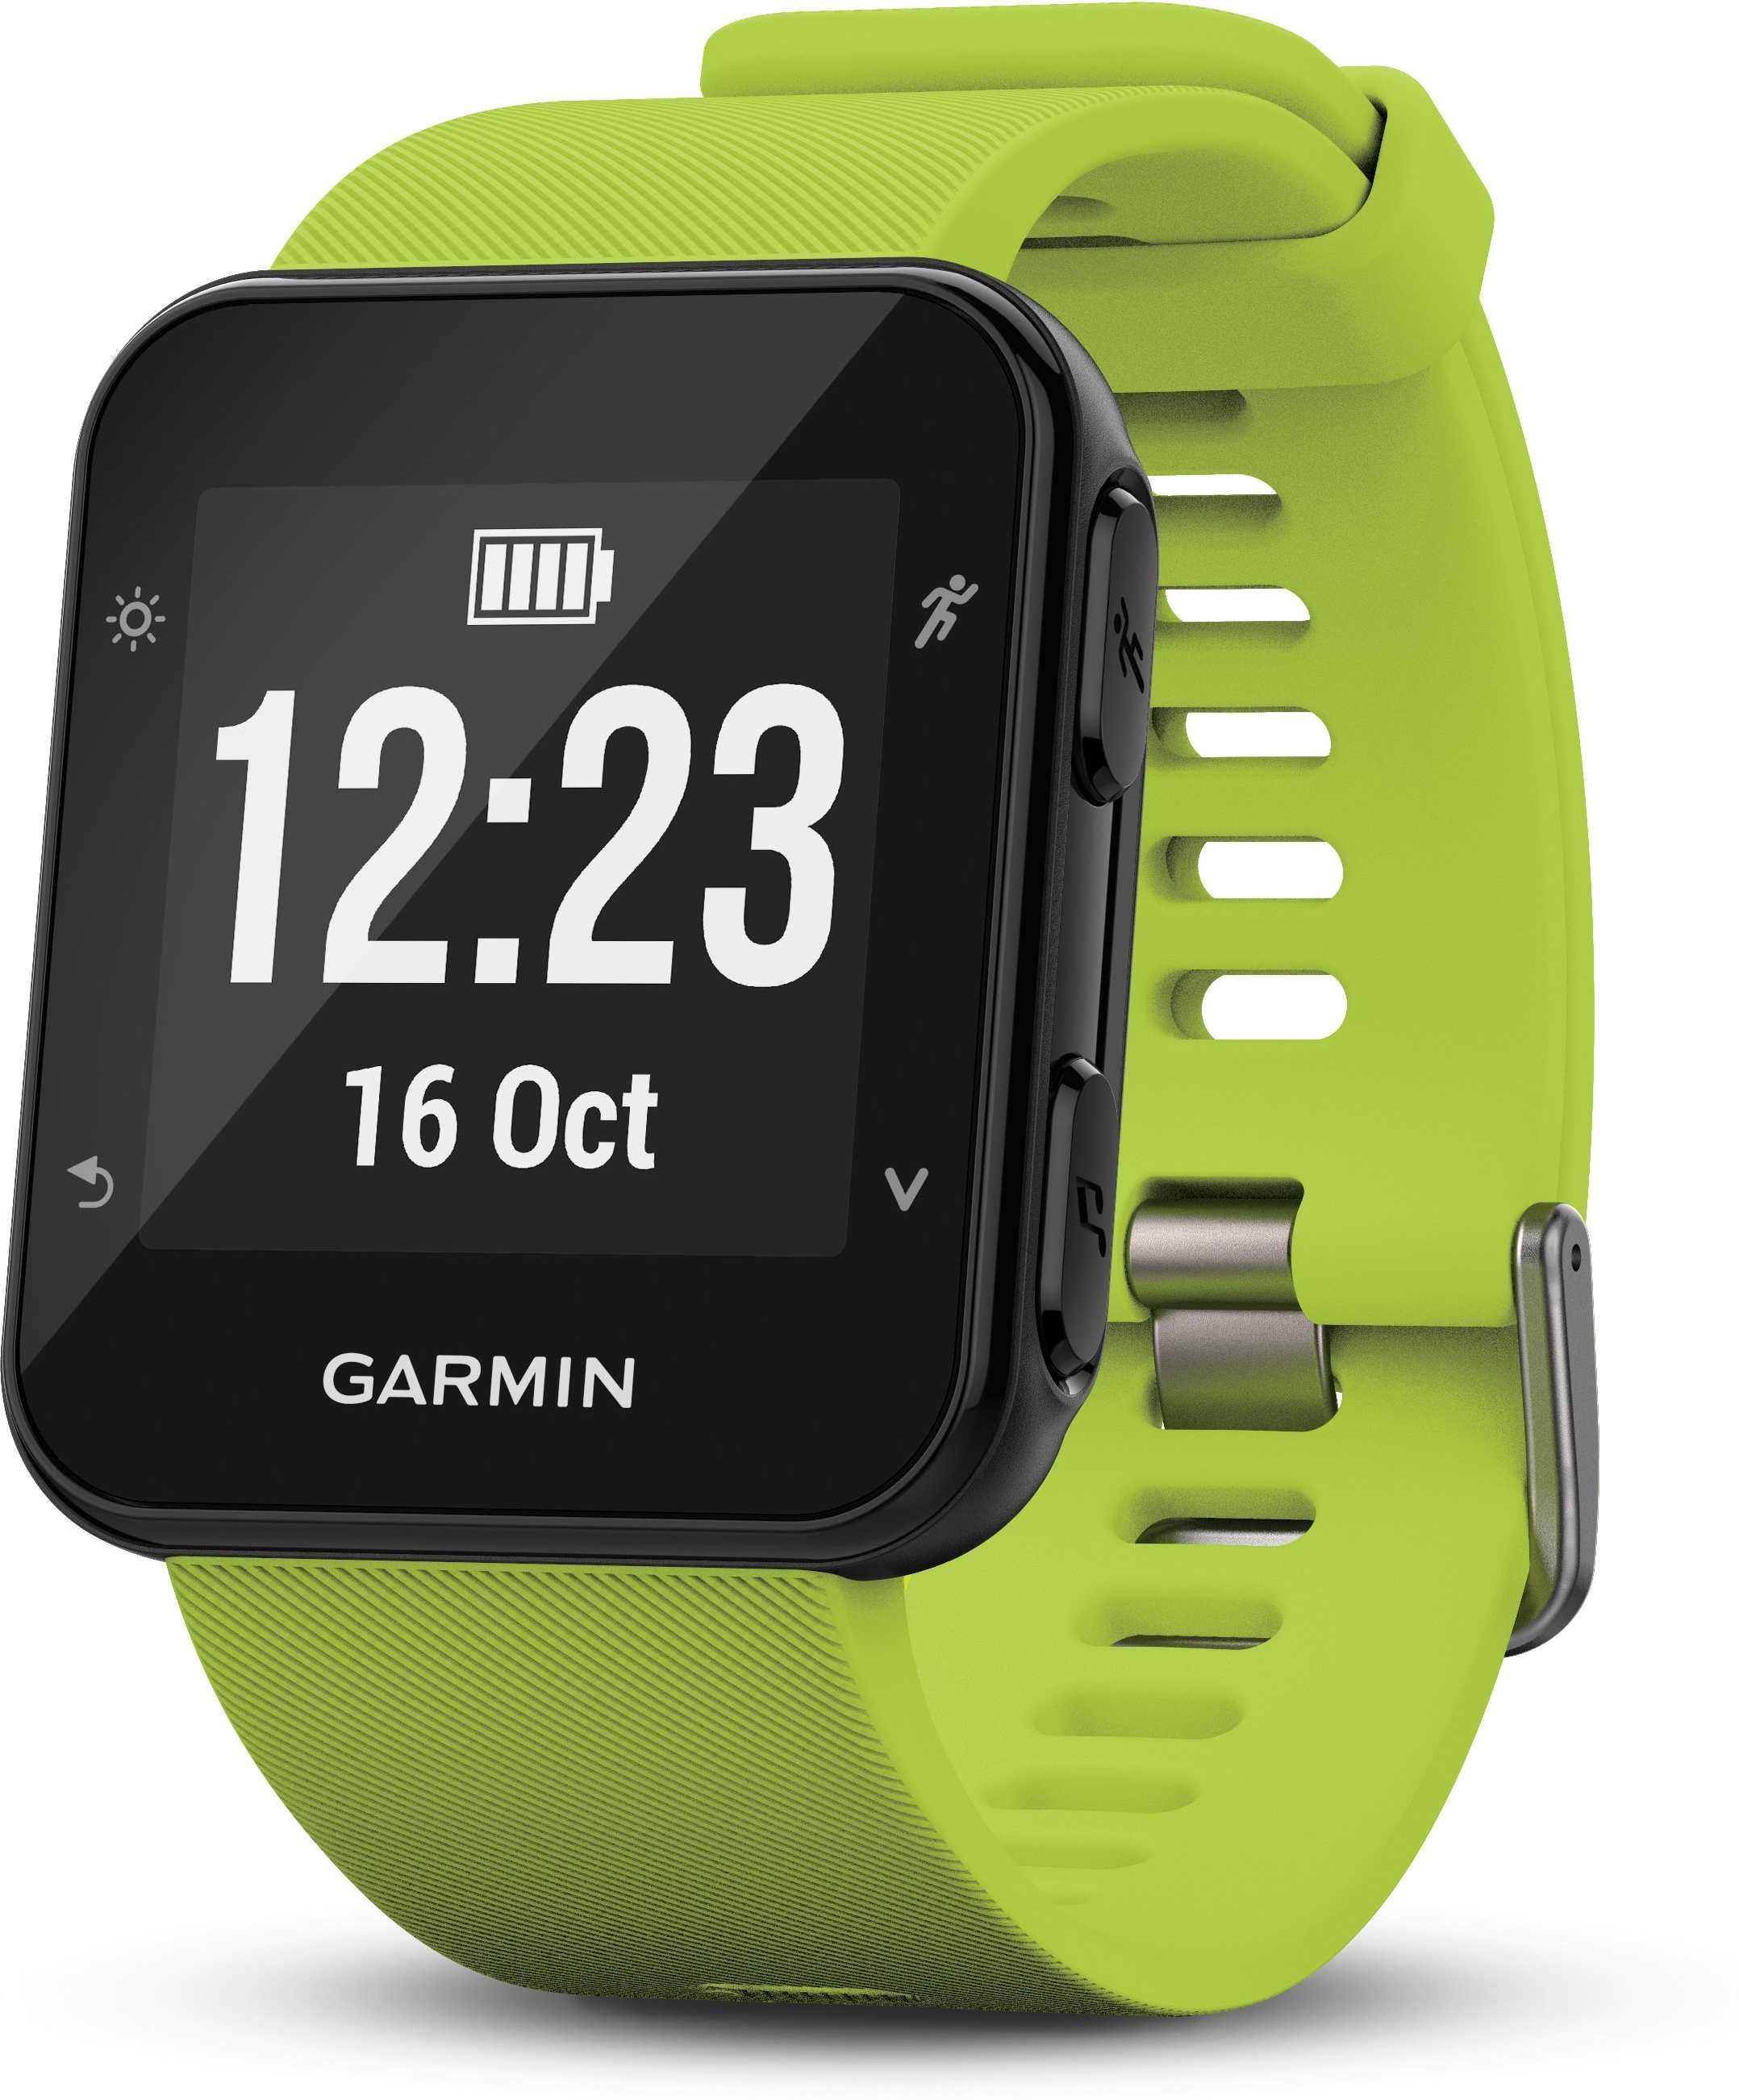 Träningsklocka Garmin Forerunner 35 limelight   Sports watches